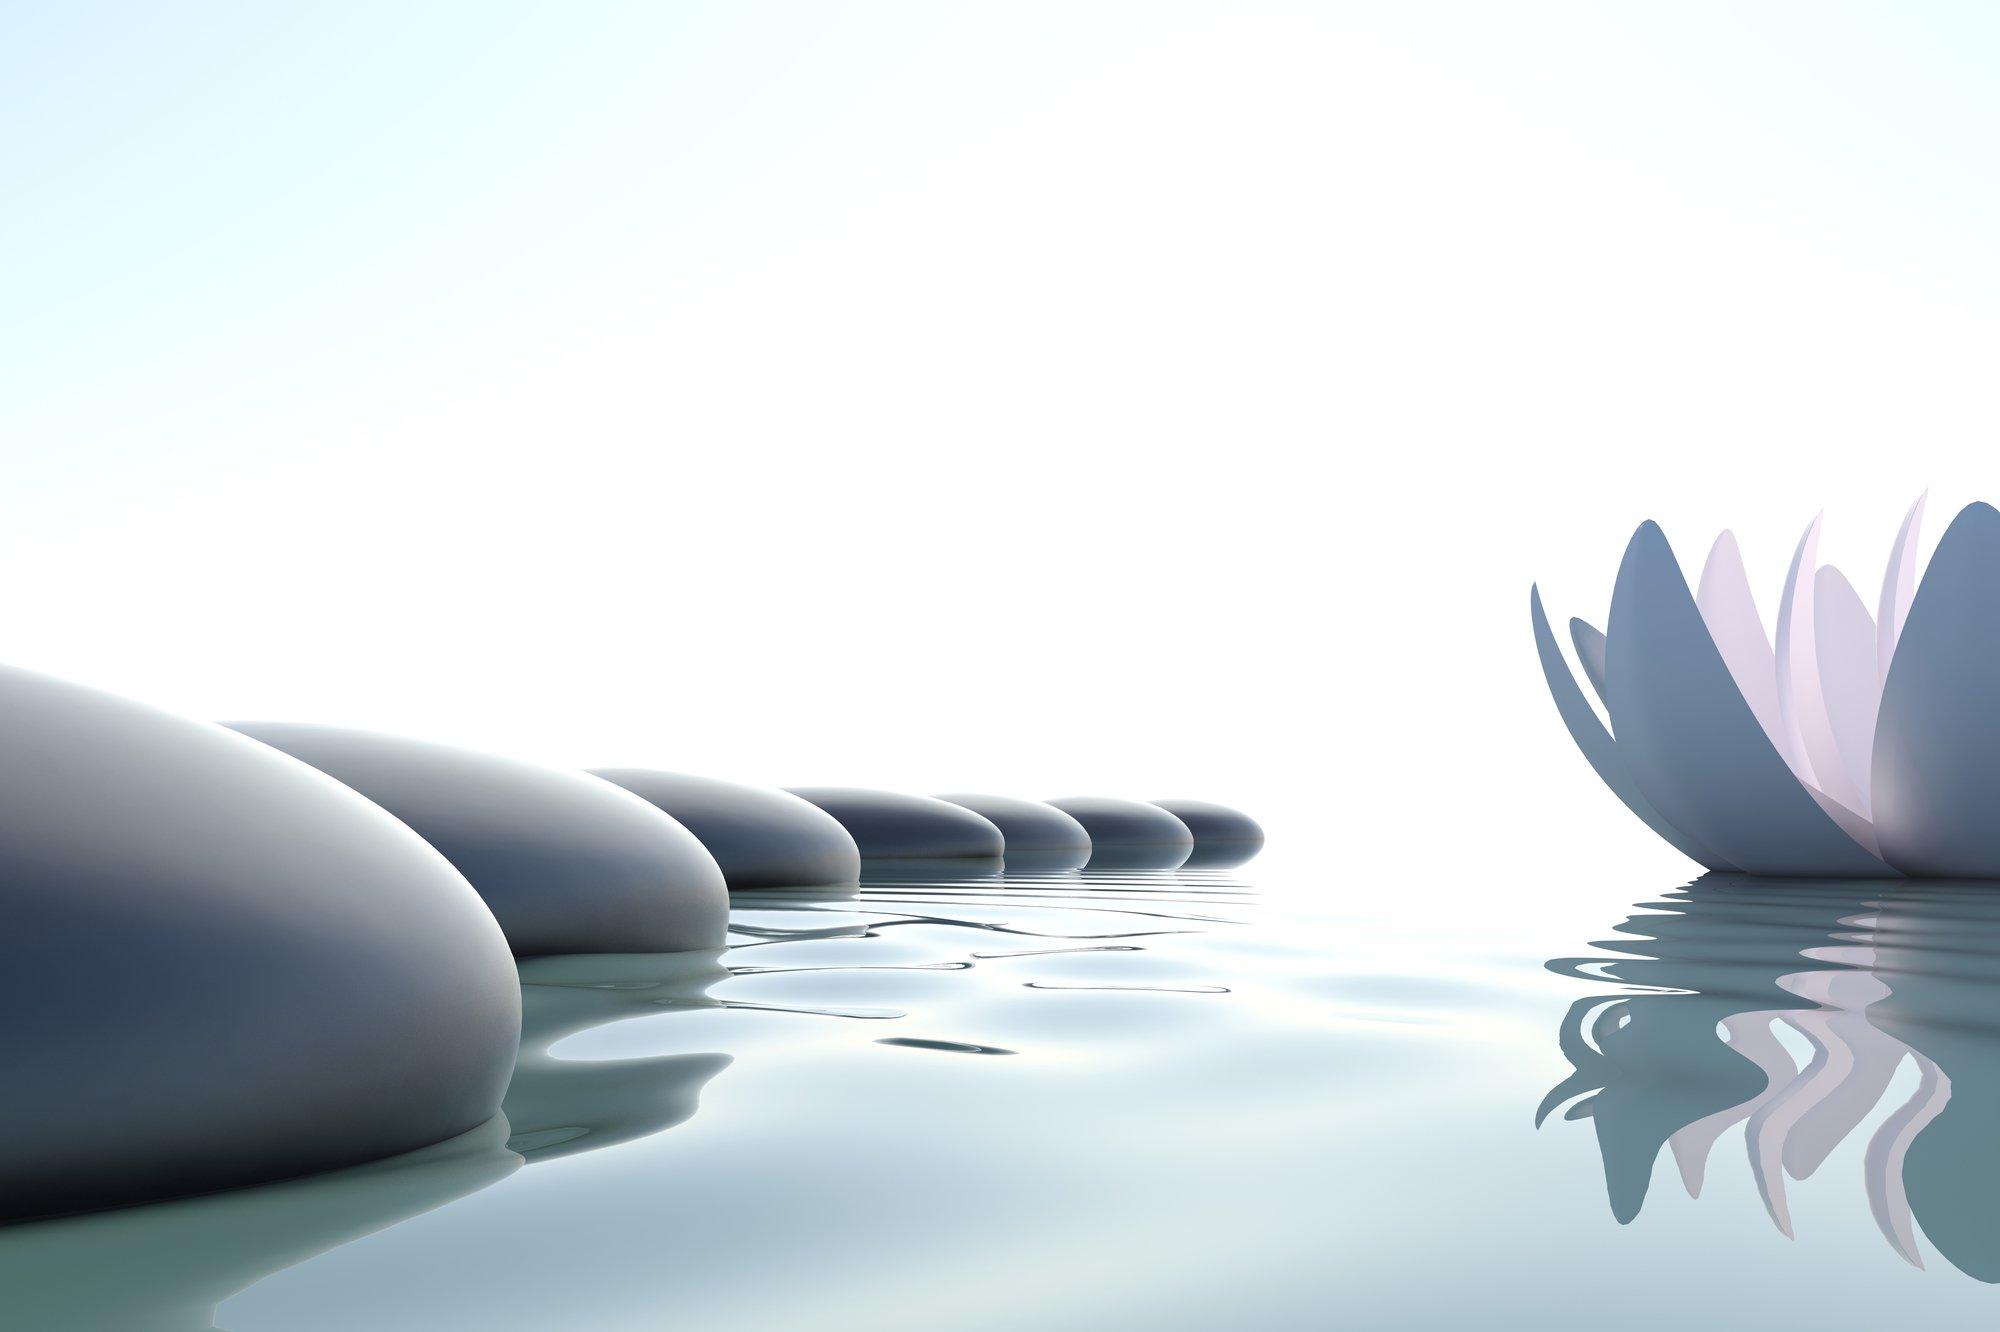 Zen flower loto near stones on white background